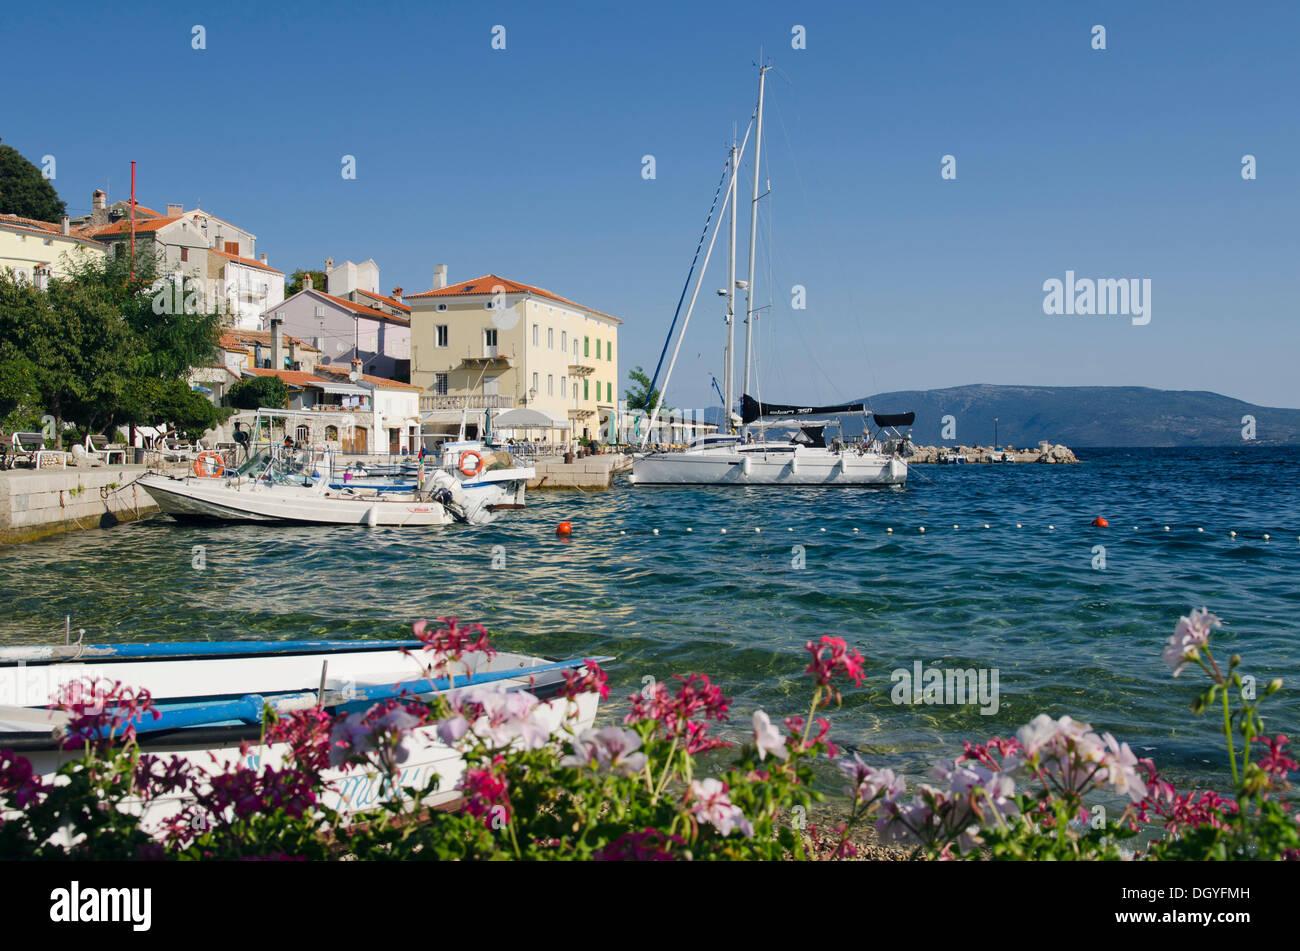 Boats in the fishing village of Valun, Cres Island, Adriatic Sea, Kvarner Gulf, Croatia, Europe Stock Photo